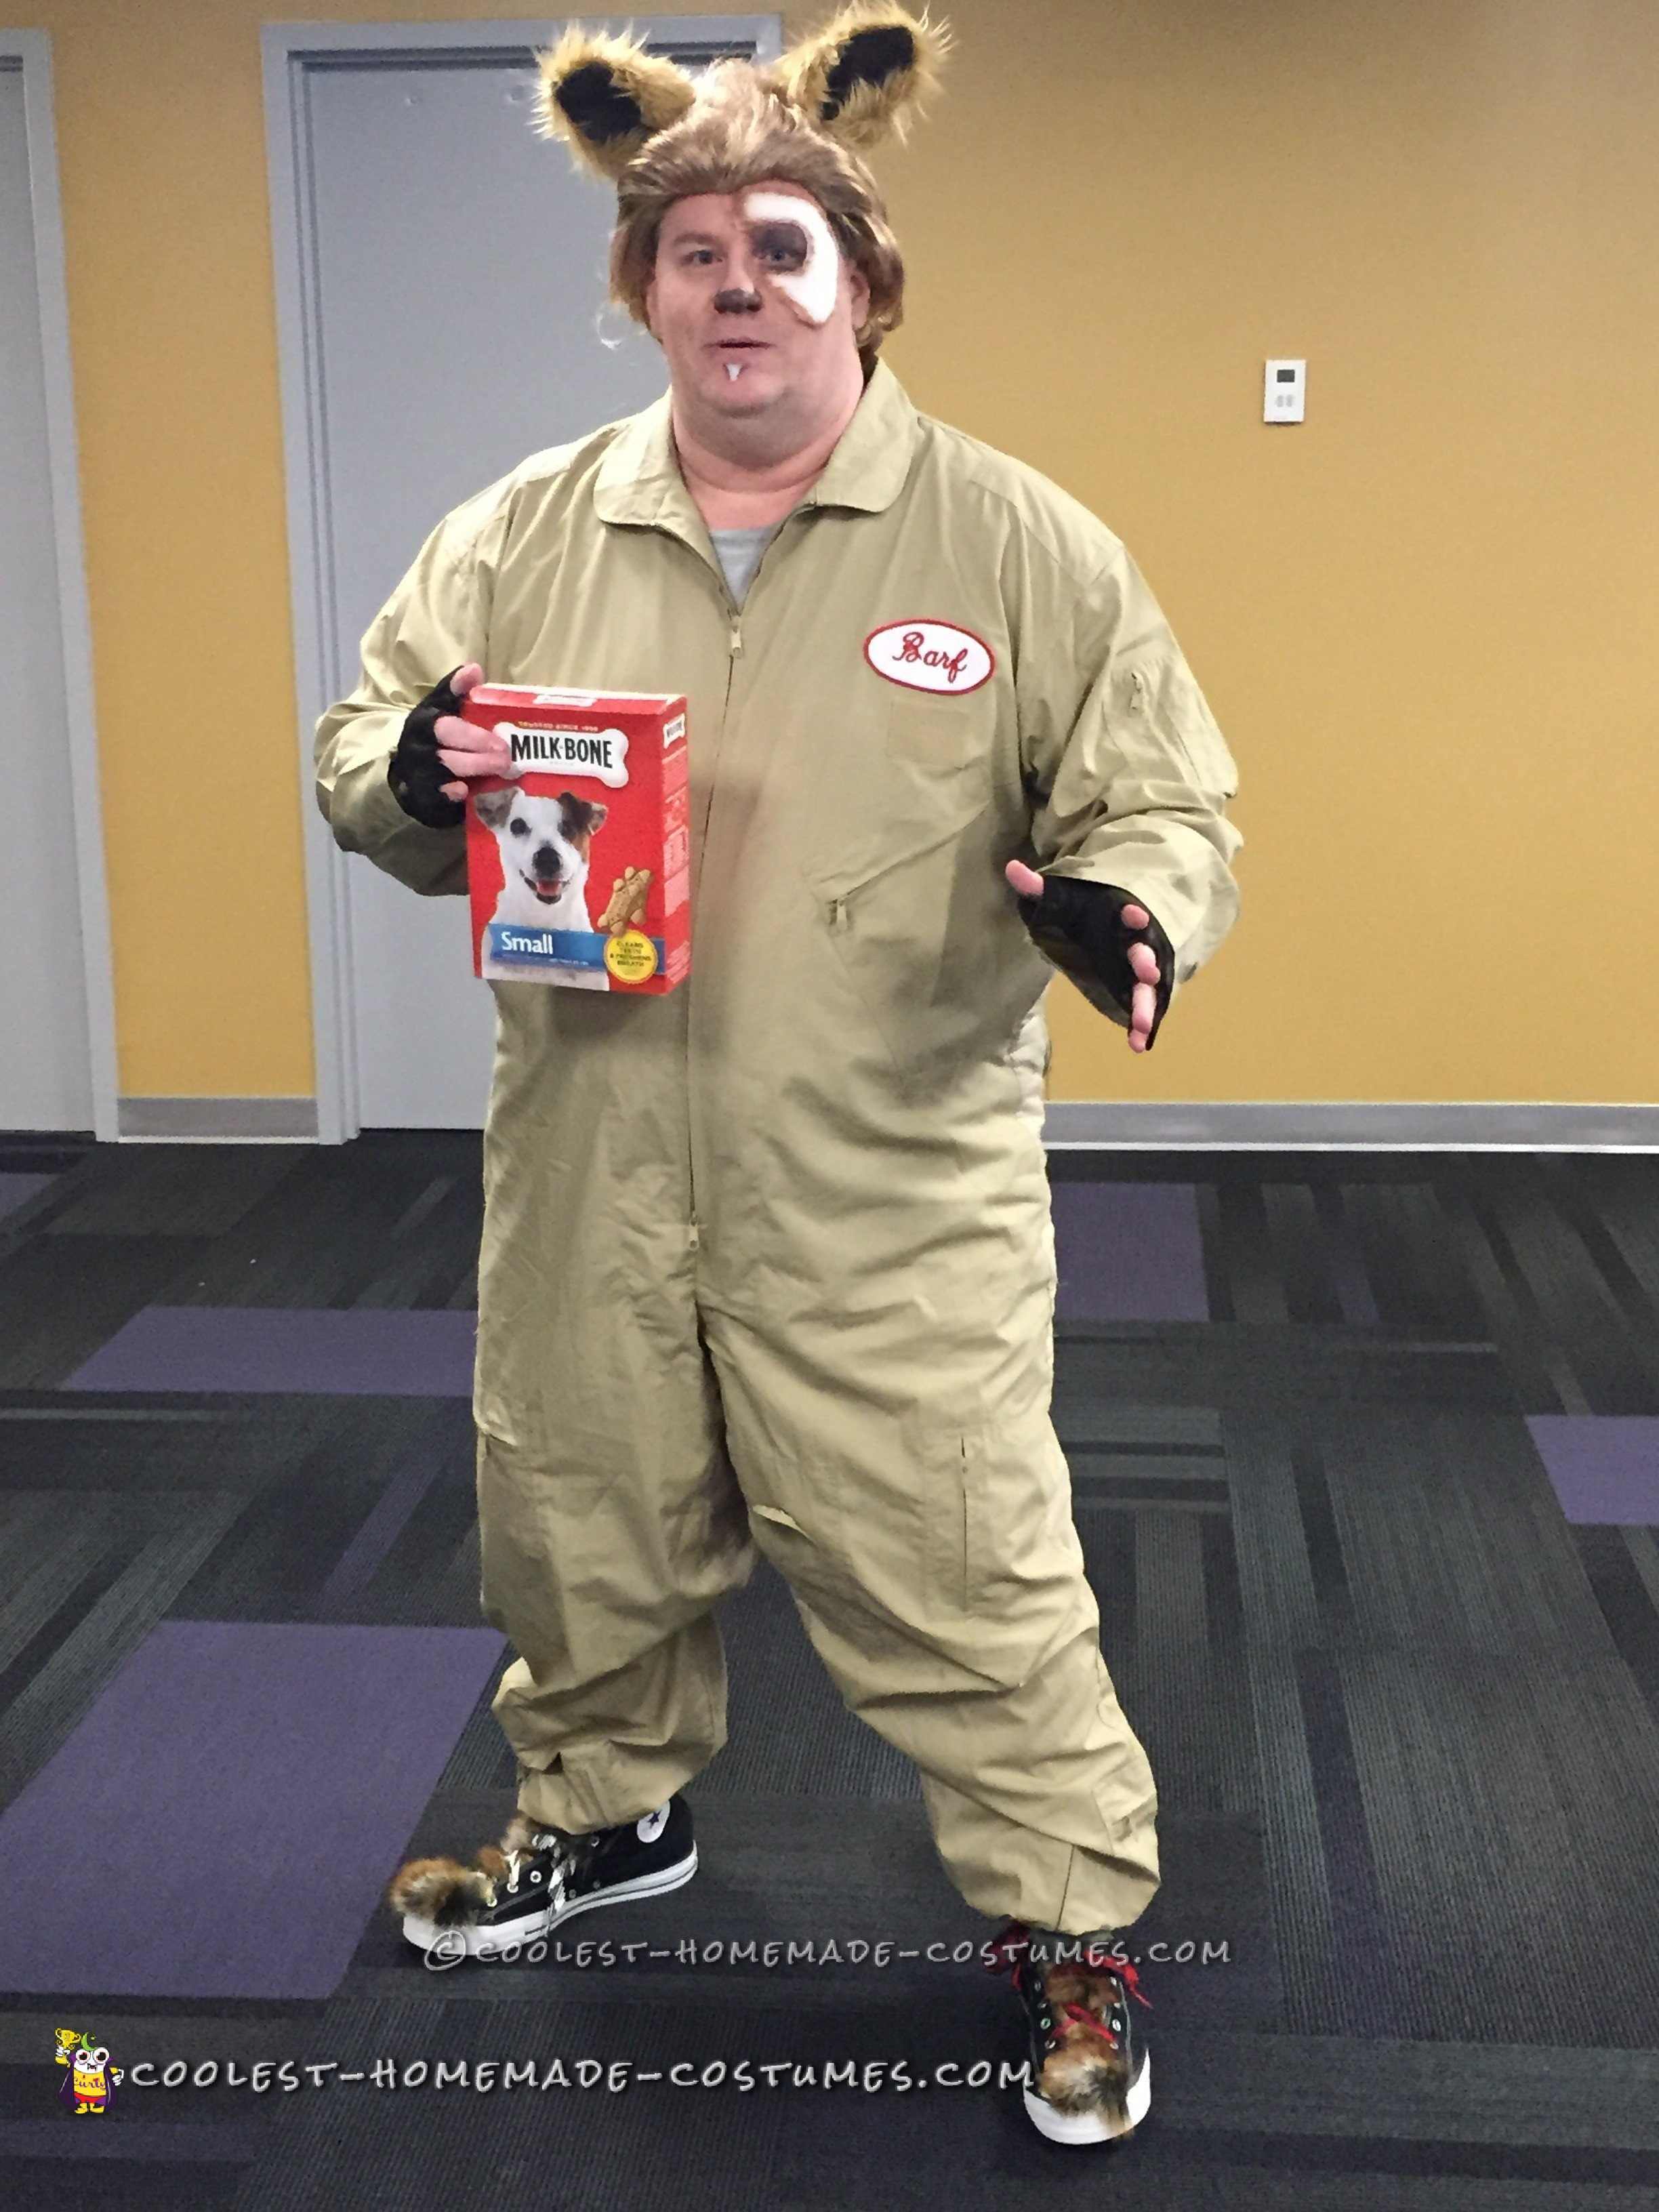 Spaceballs - The Halloween Costume - BARF!